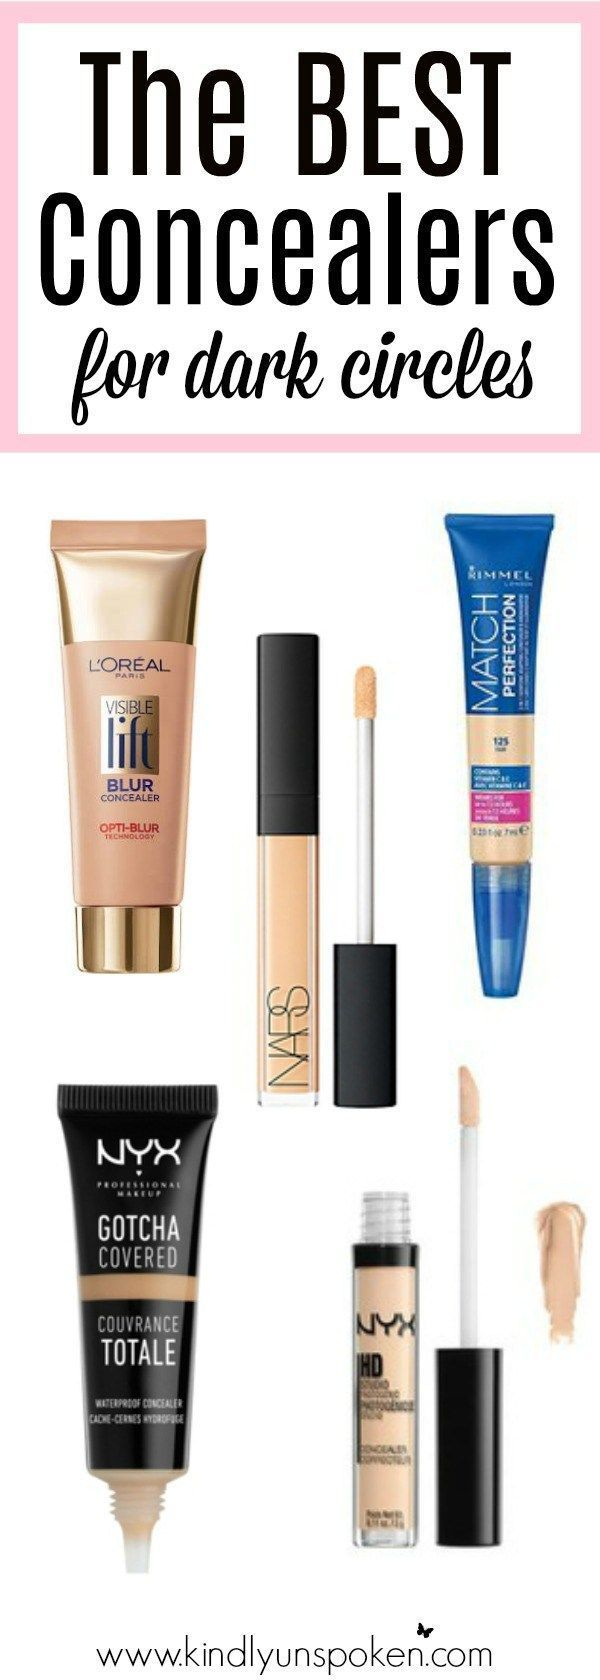 Top 5 Under Eye Concealer für Augenringe   - Beauty Bloggers {Group Board} - #Augenringe #Beauty #Bloggers #Board #Concealer #eye #für #Group #Top #darkcircle